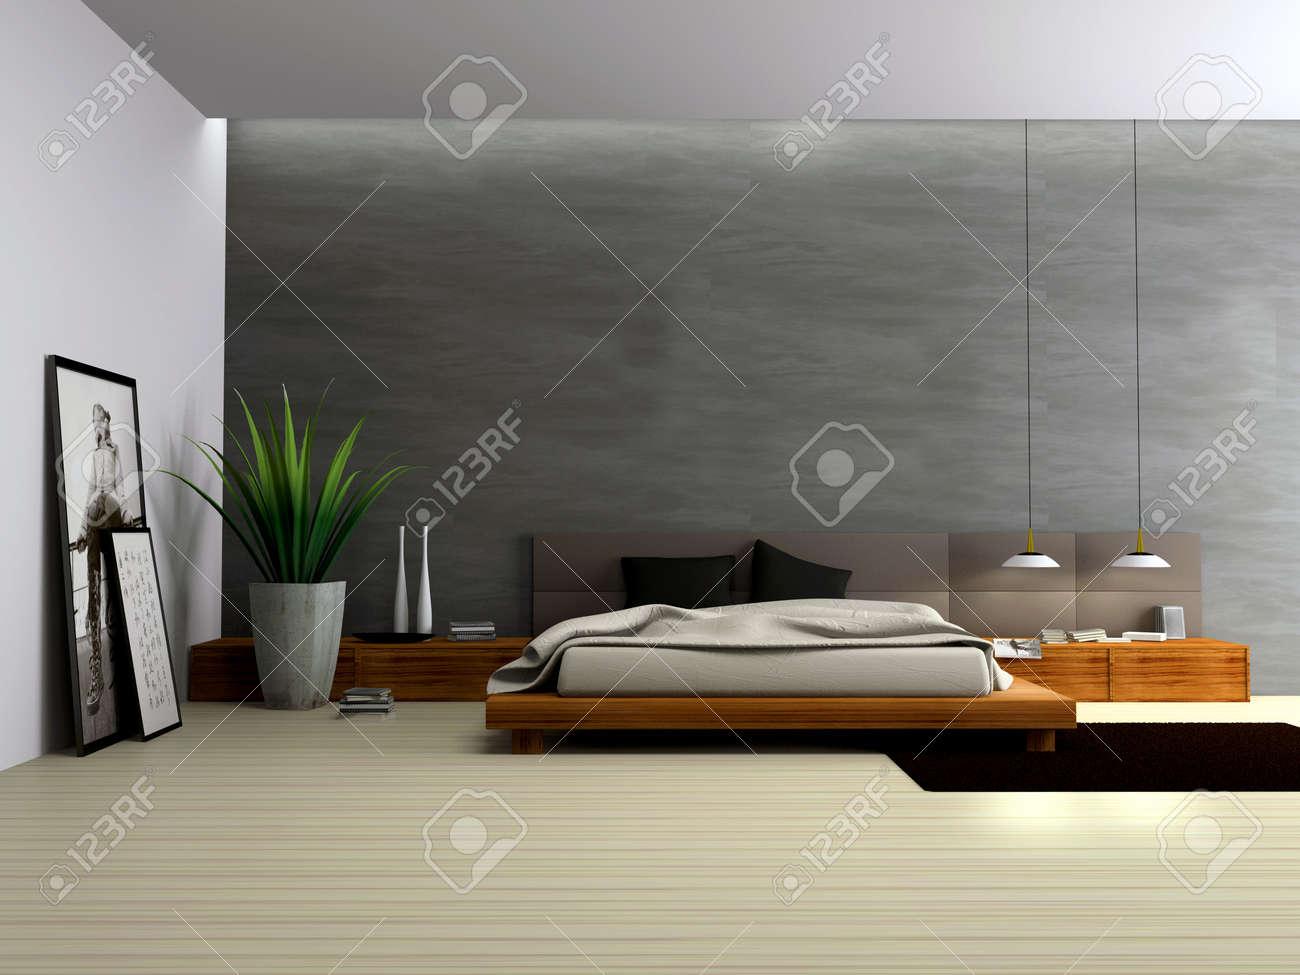 Interior of modern bedroom 3D rendering - 1236040